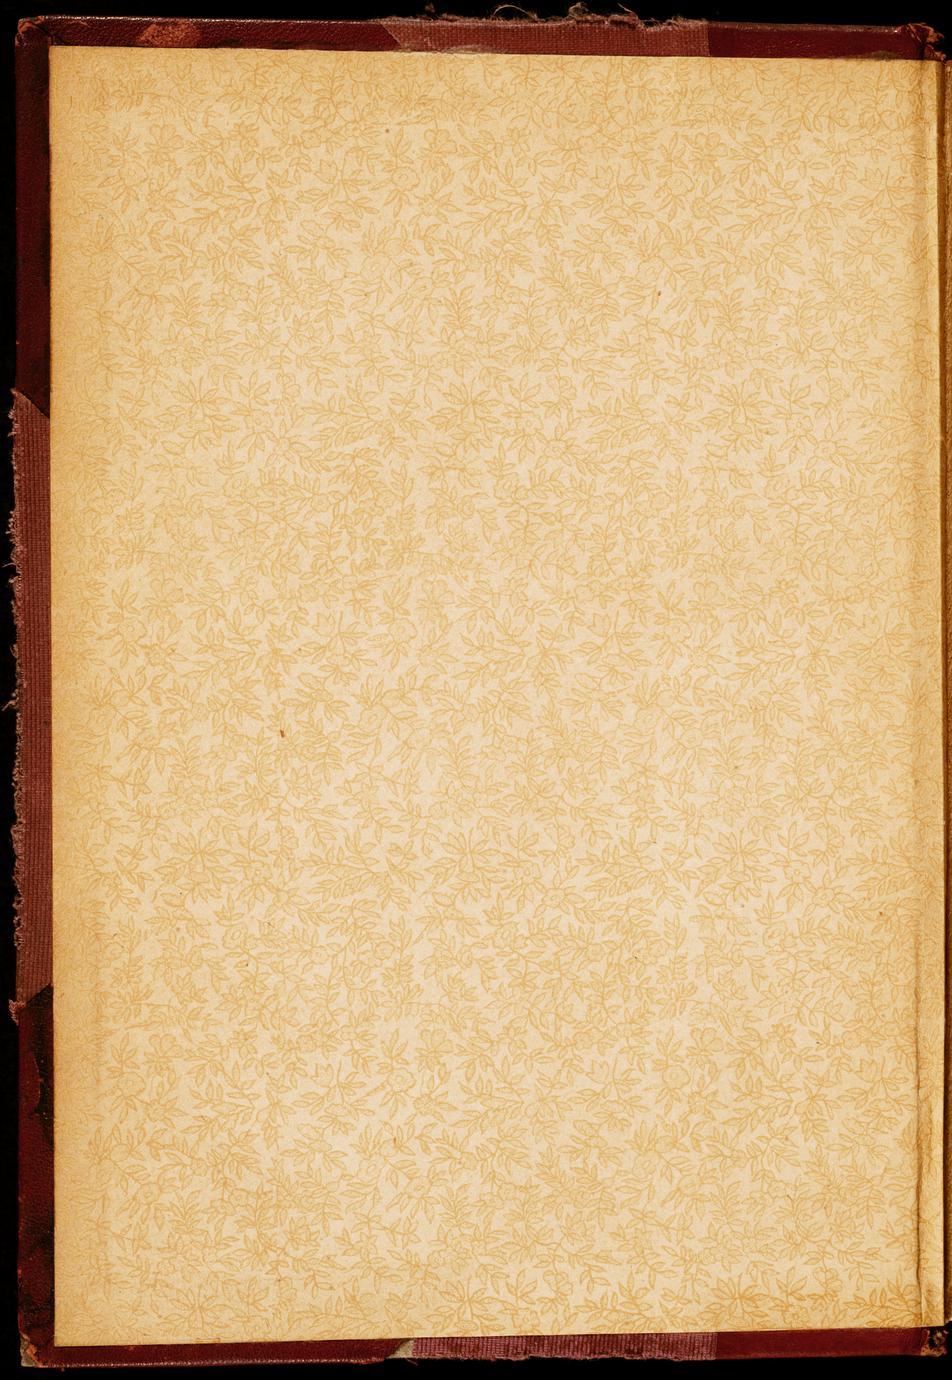 The works of Washington Irving (3 of 3)